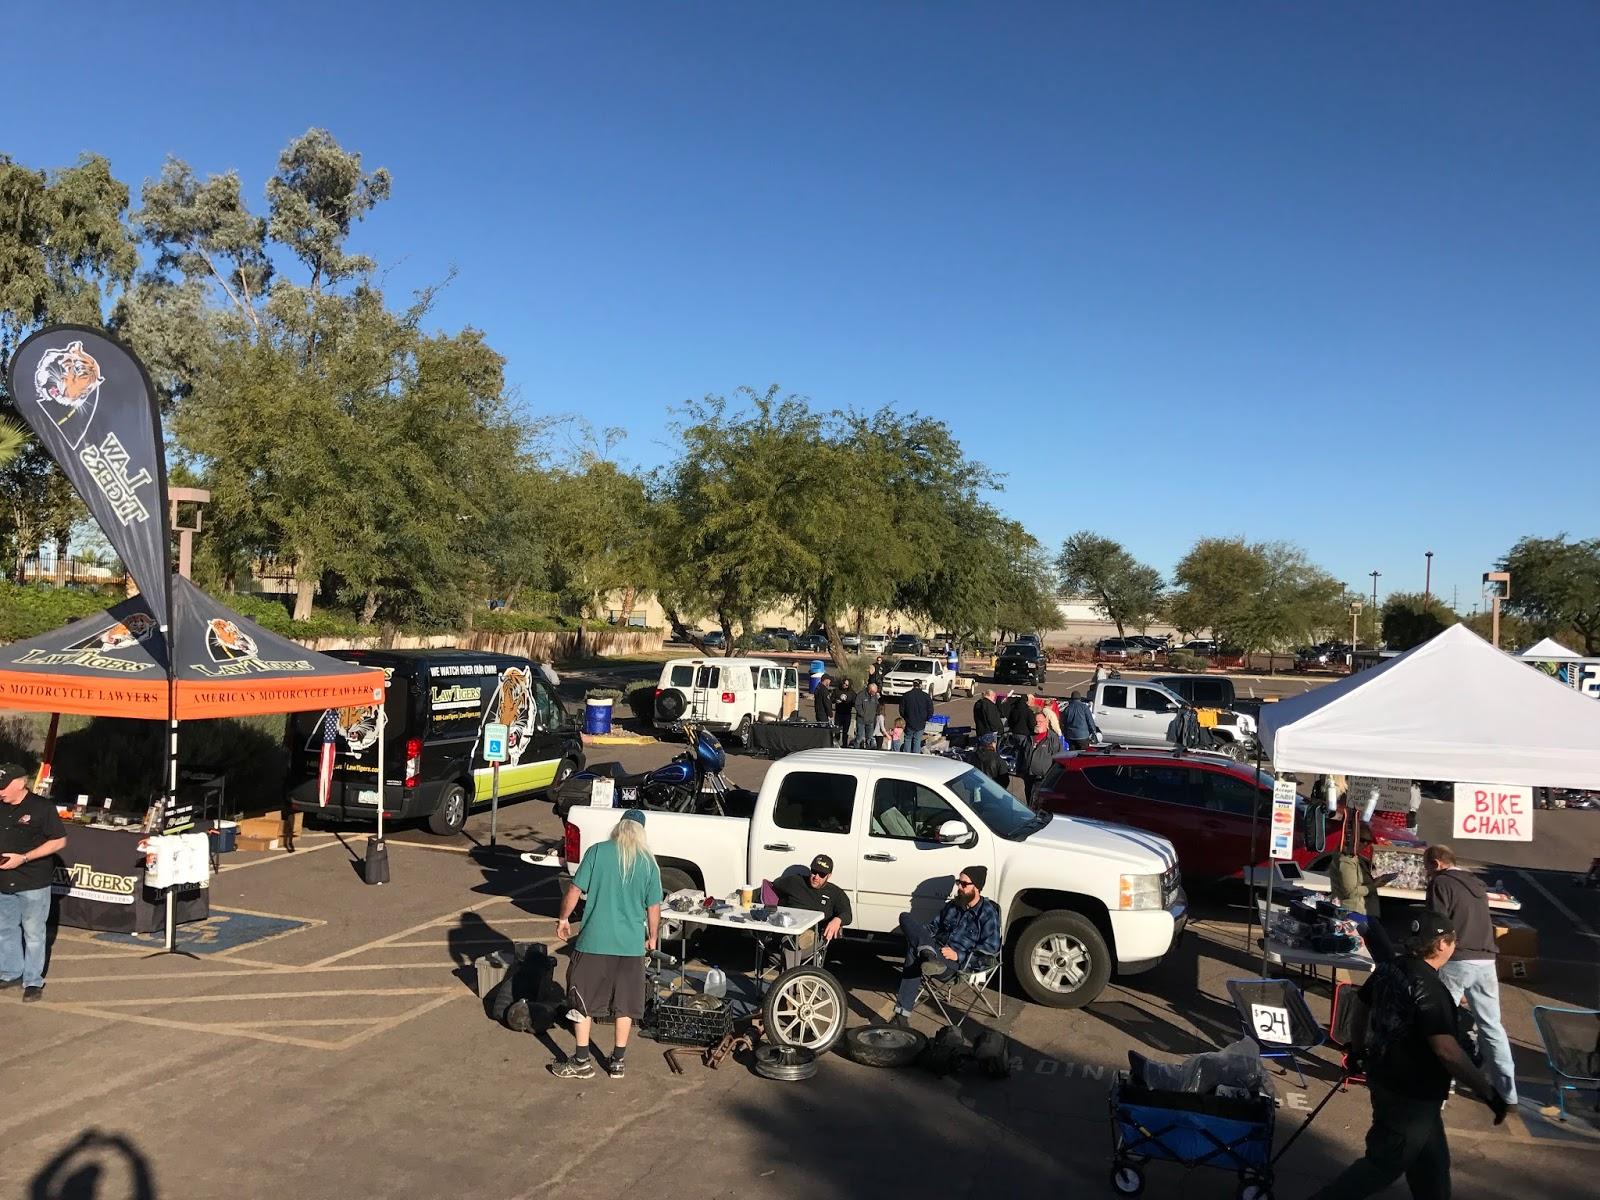 motorcycle swap meet in arizona